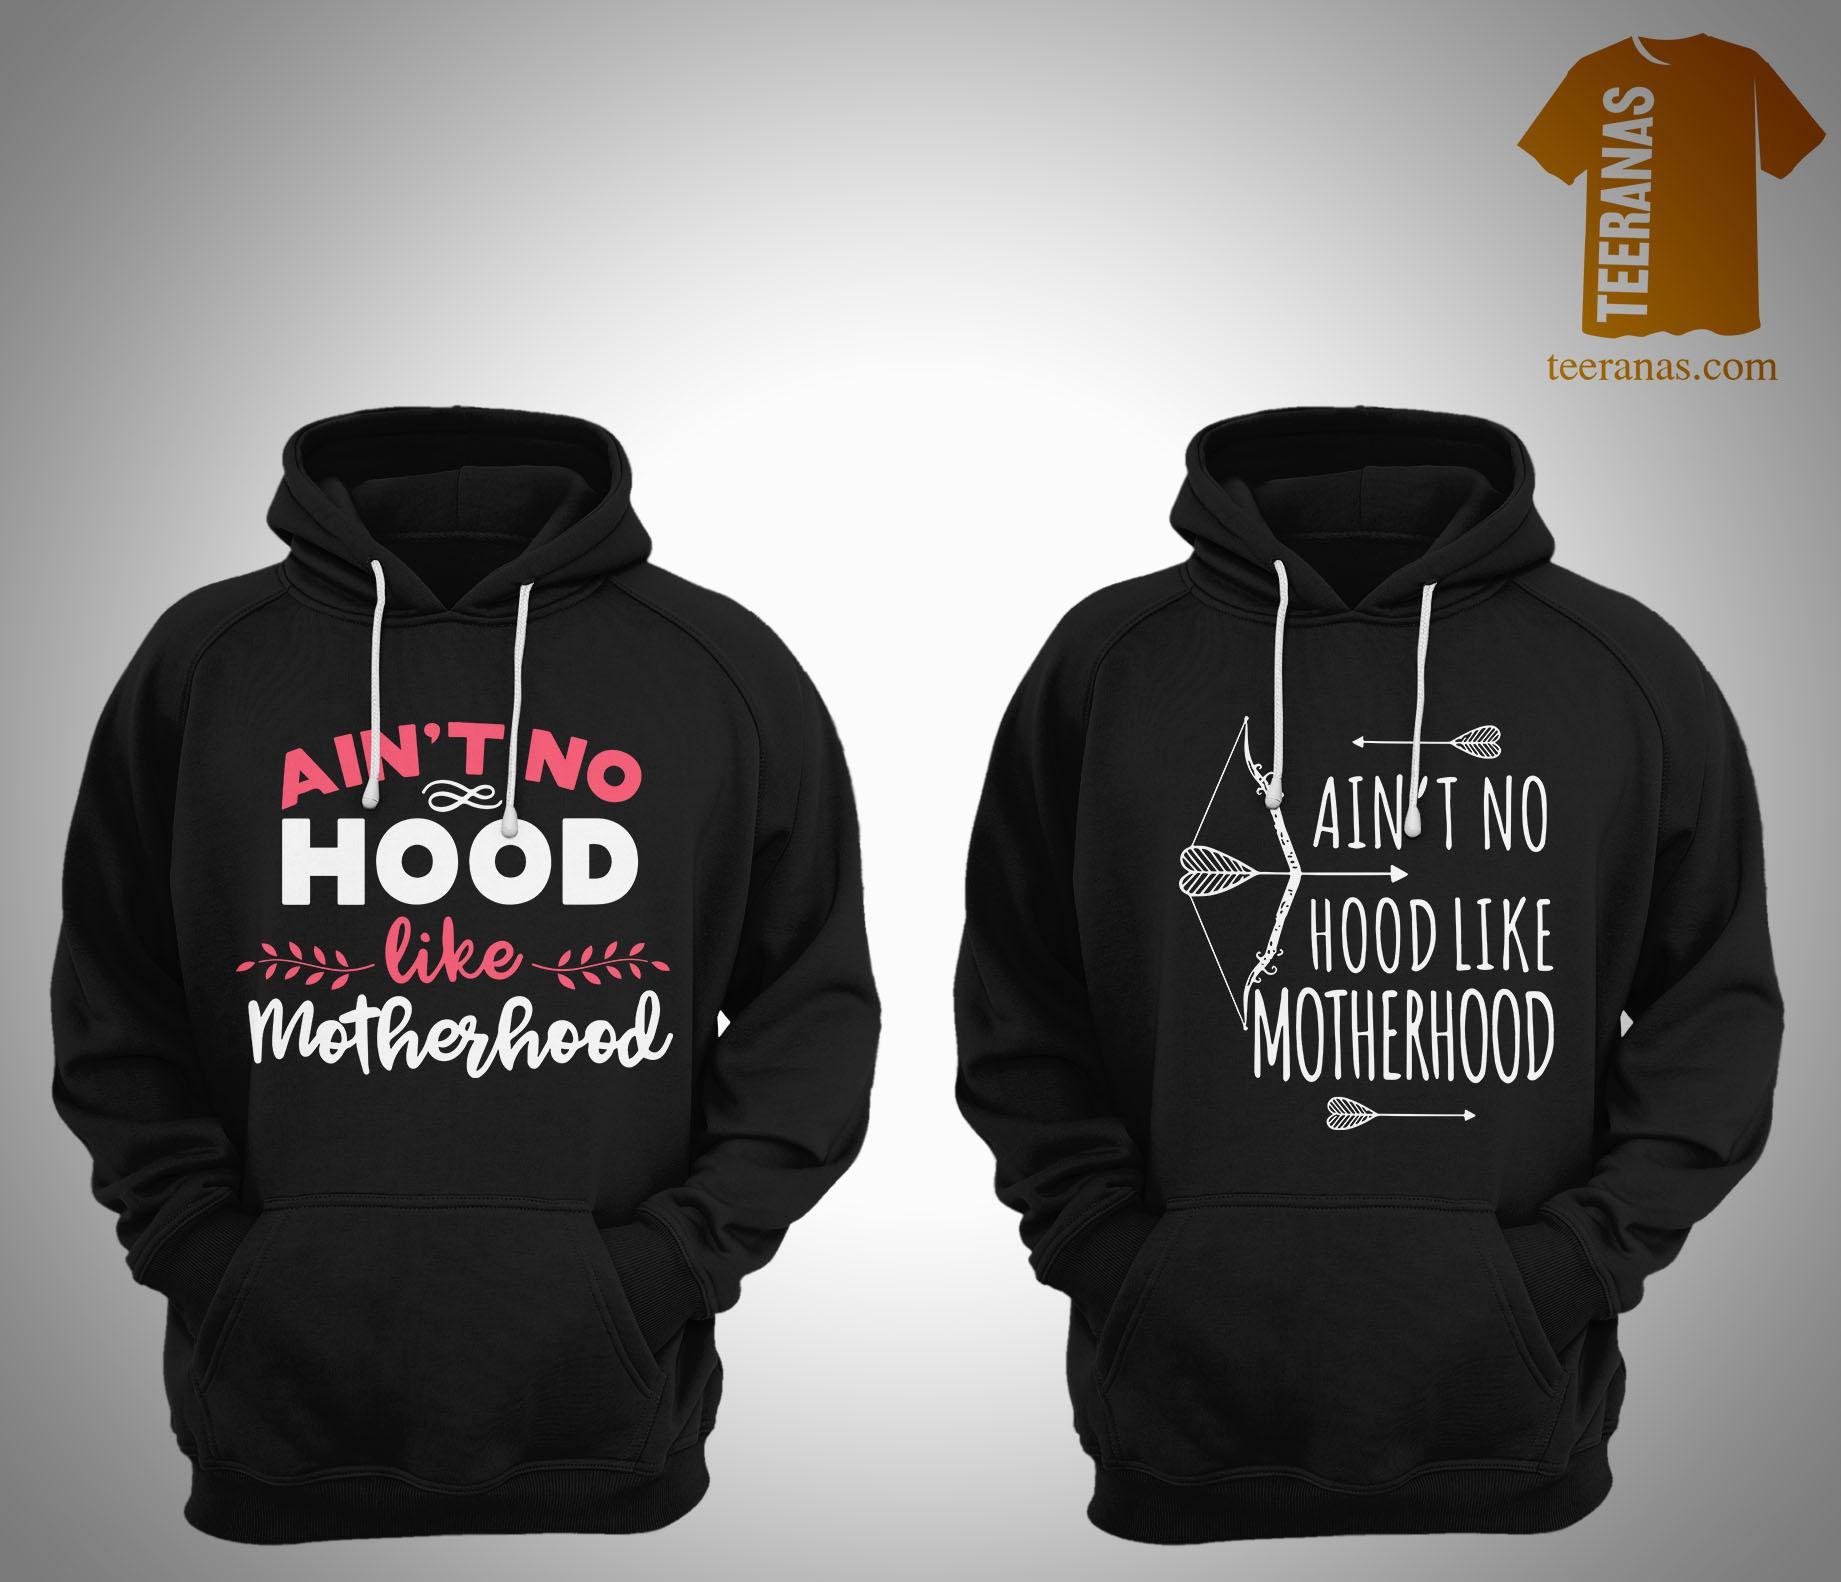 Aint No Hood Like Motherhood Hoodie